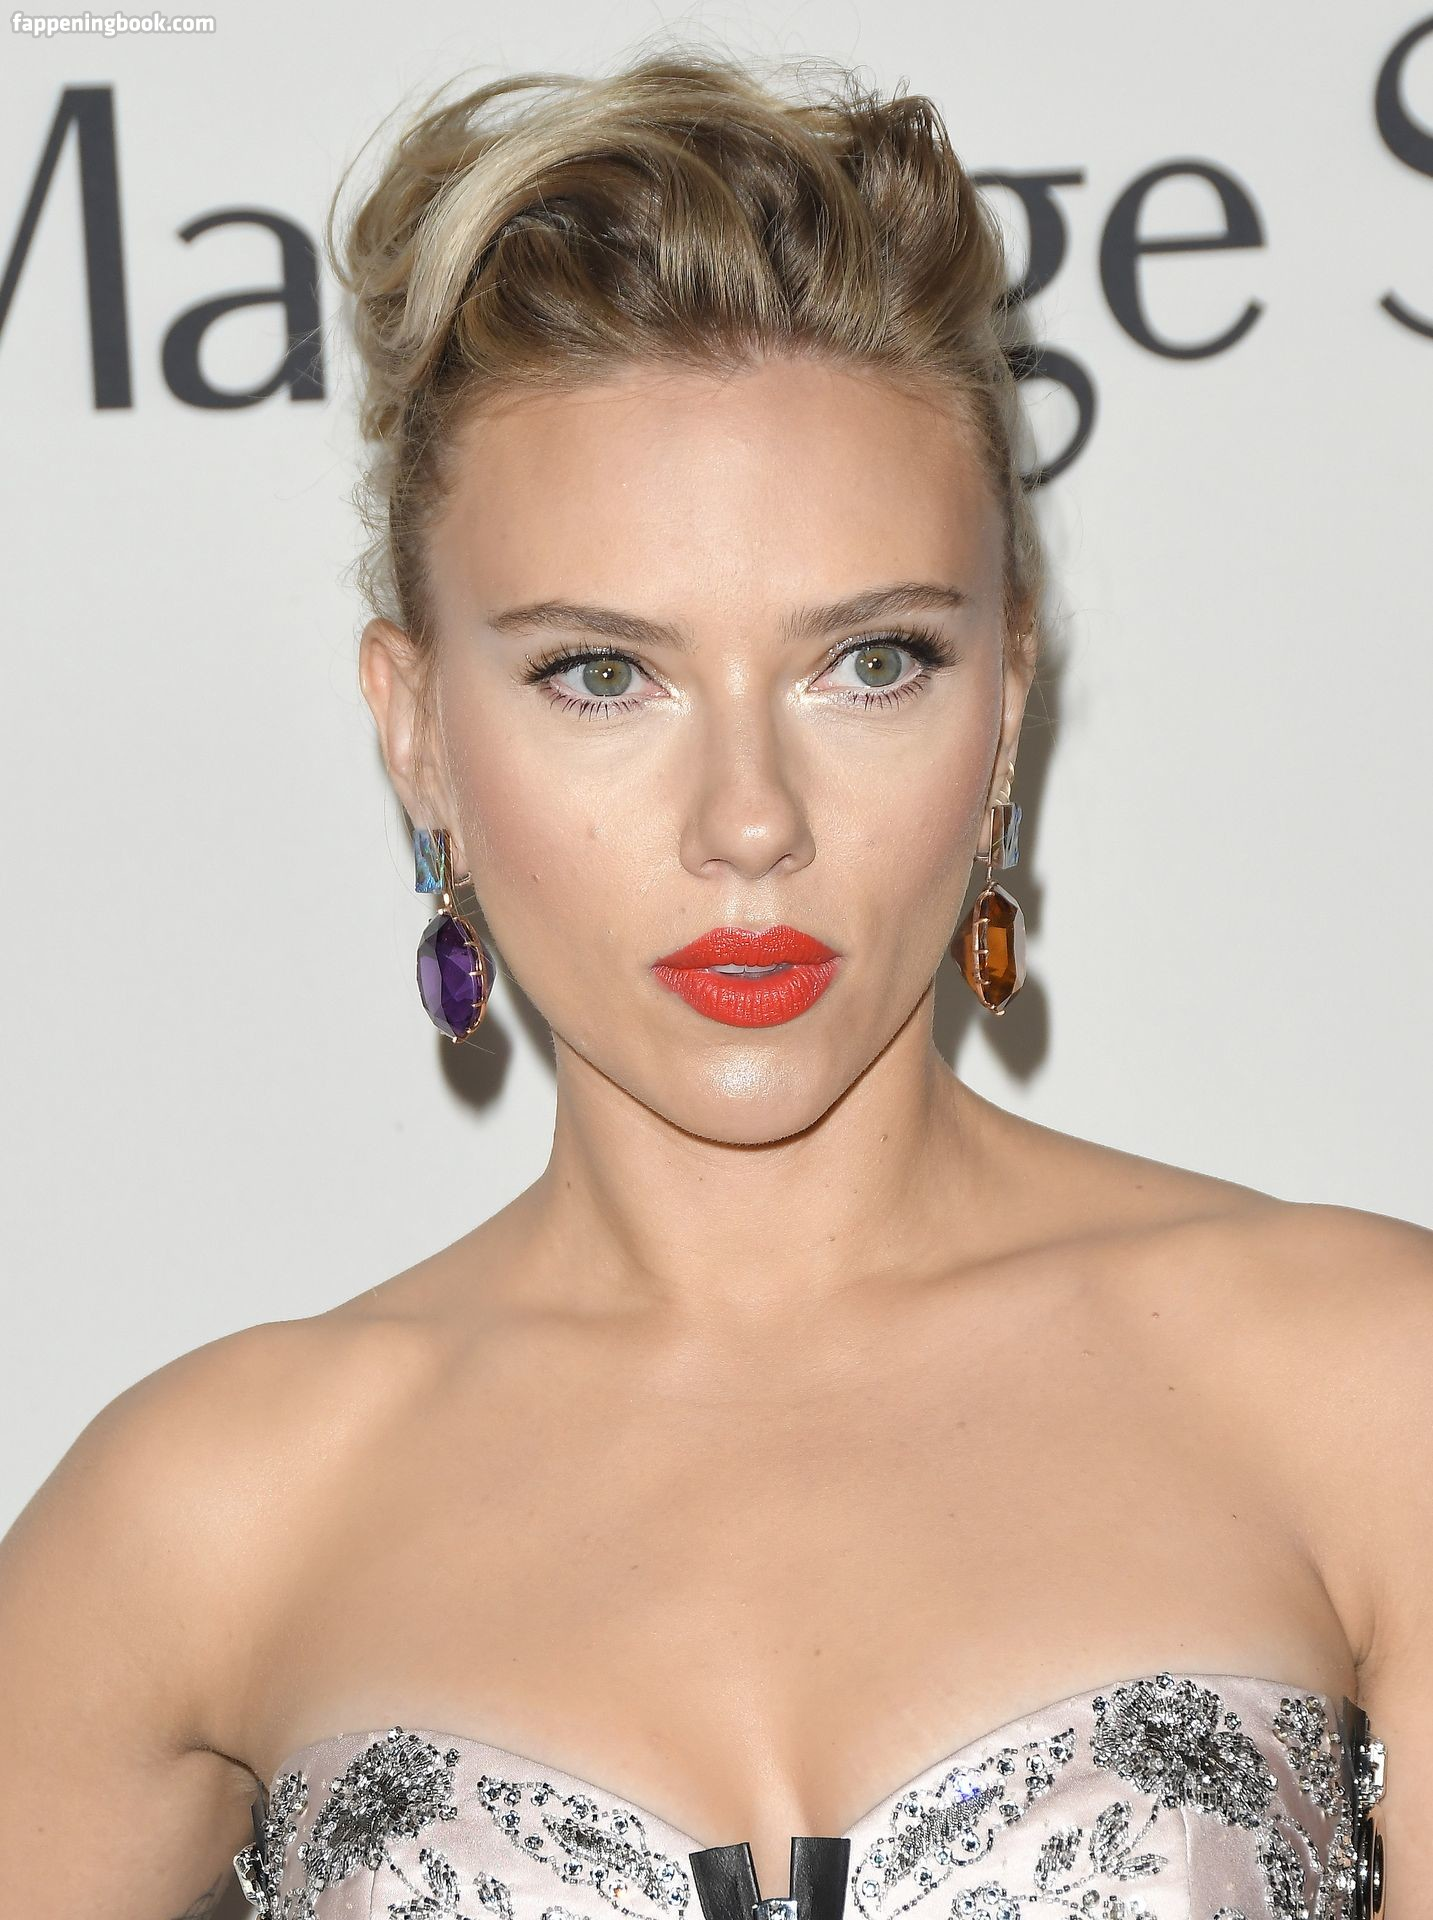 Hots Scarlett Johansson And Nude Photos Gif